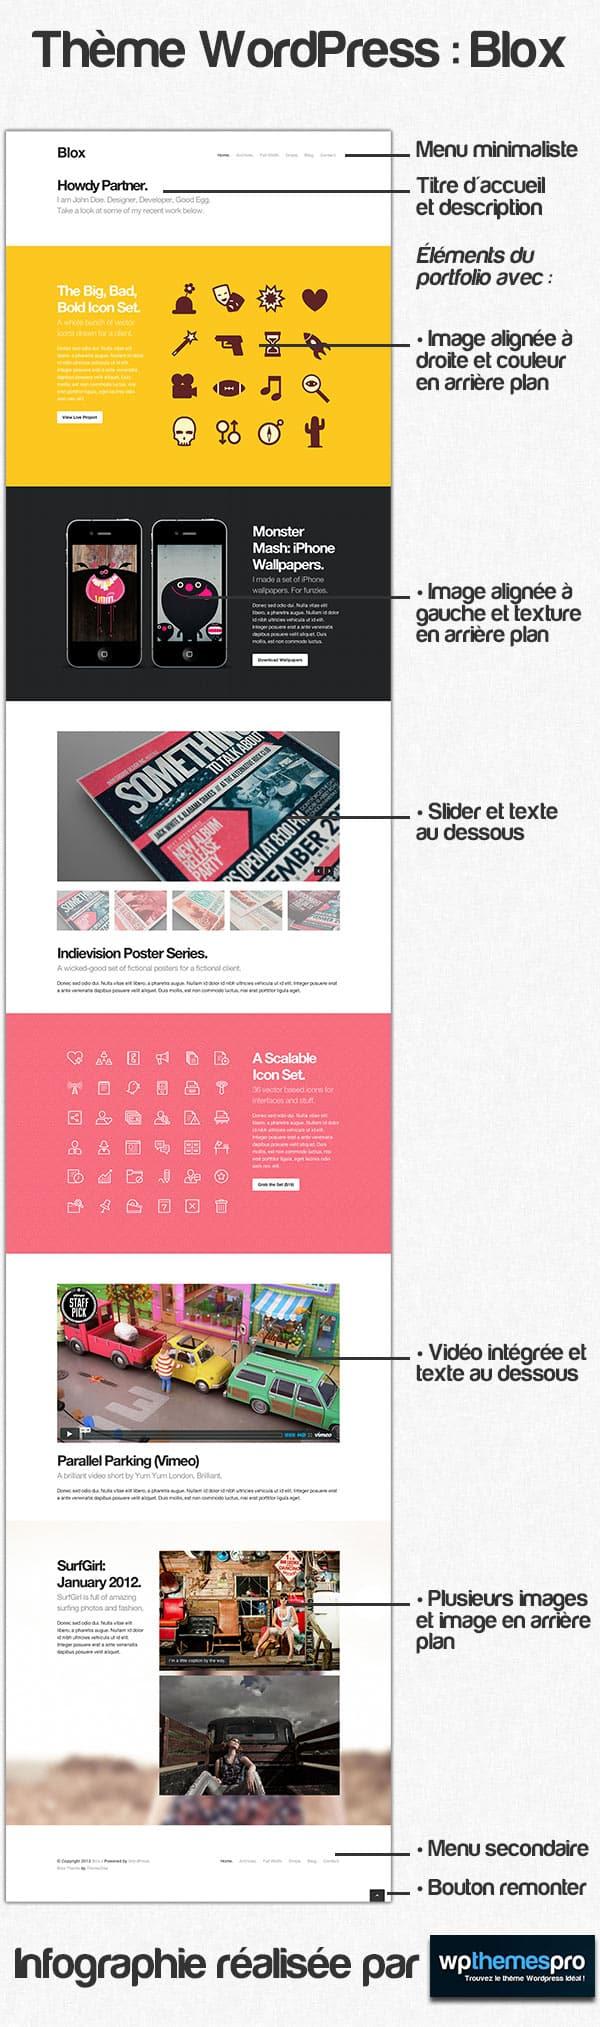 Infographie Theme WordPress Blox